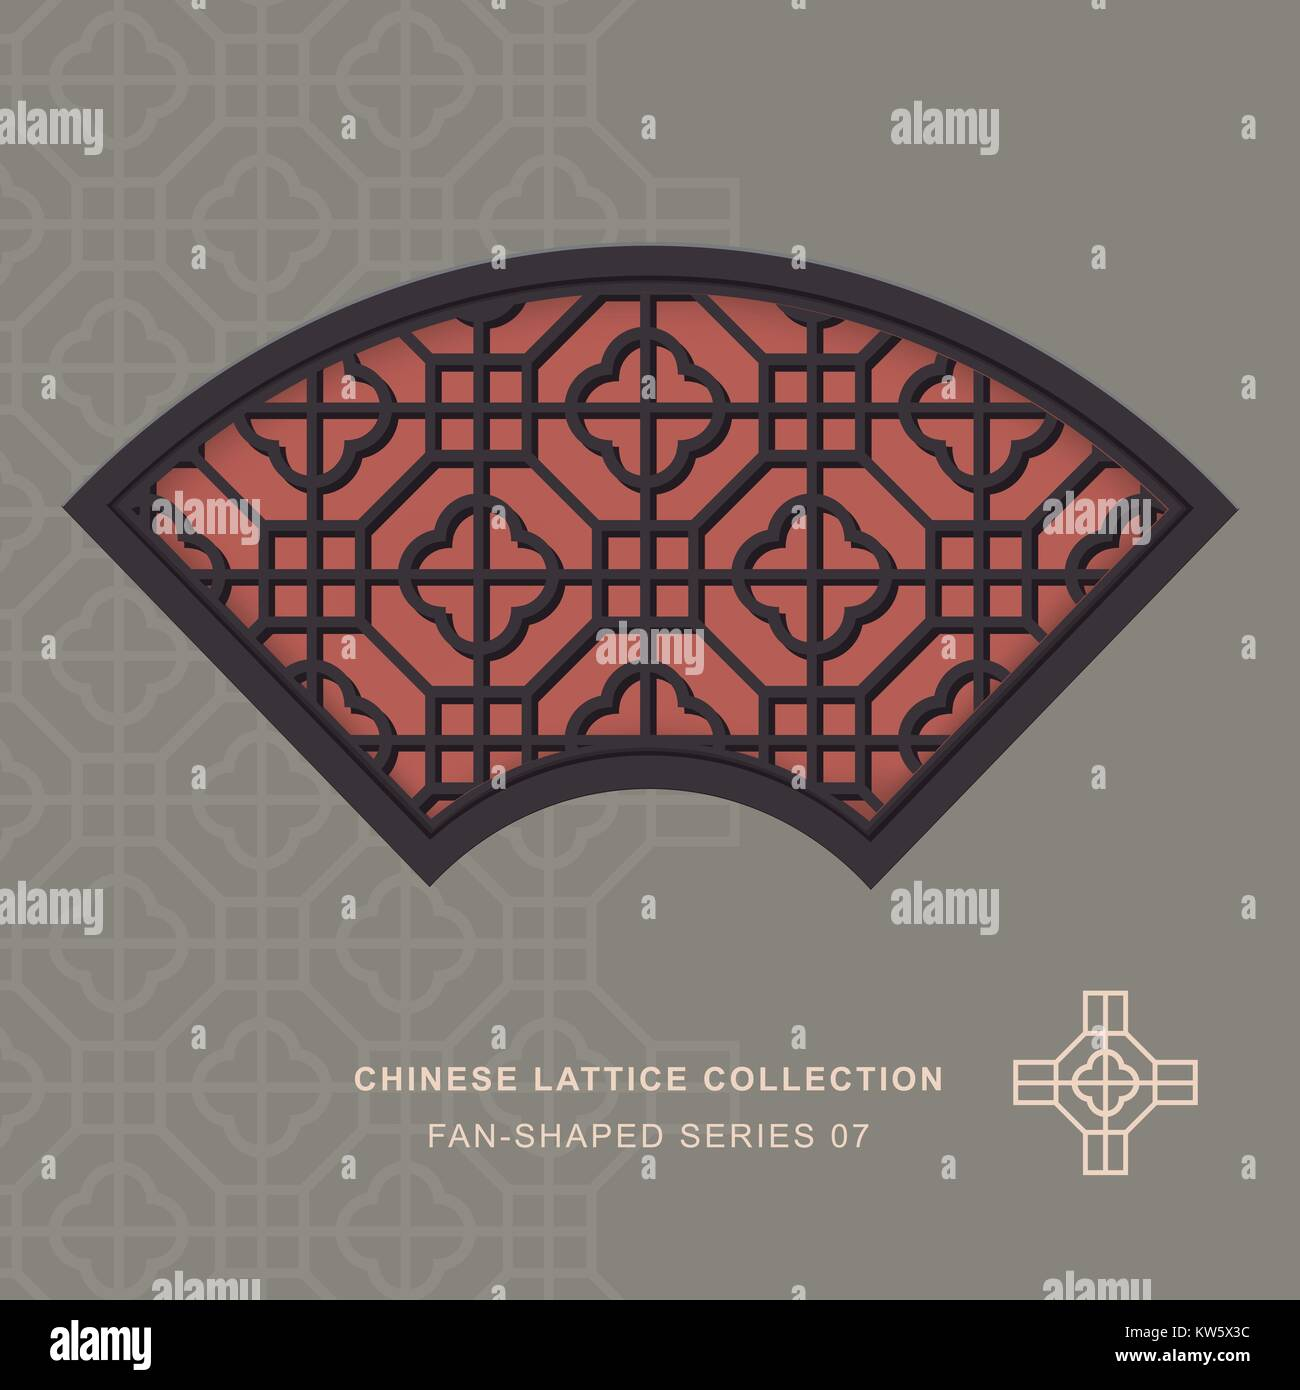 Chinese window tracery lattice fan shaped frame series of cross chinese window tracery lattice fan shaped frame series of cross square jeuxipadfo Images